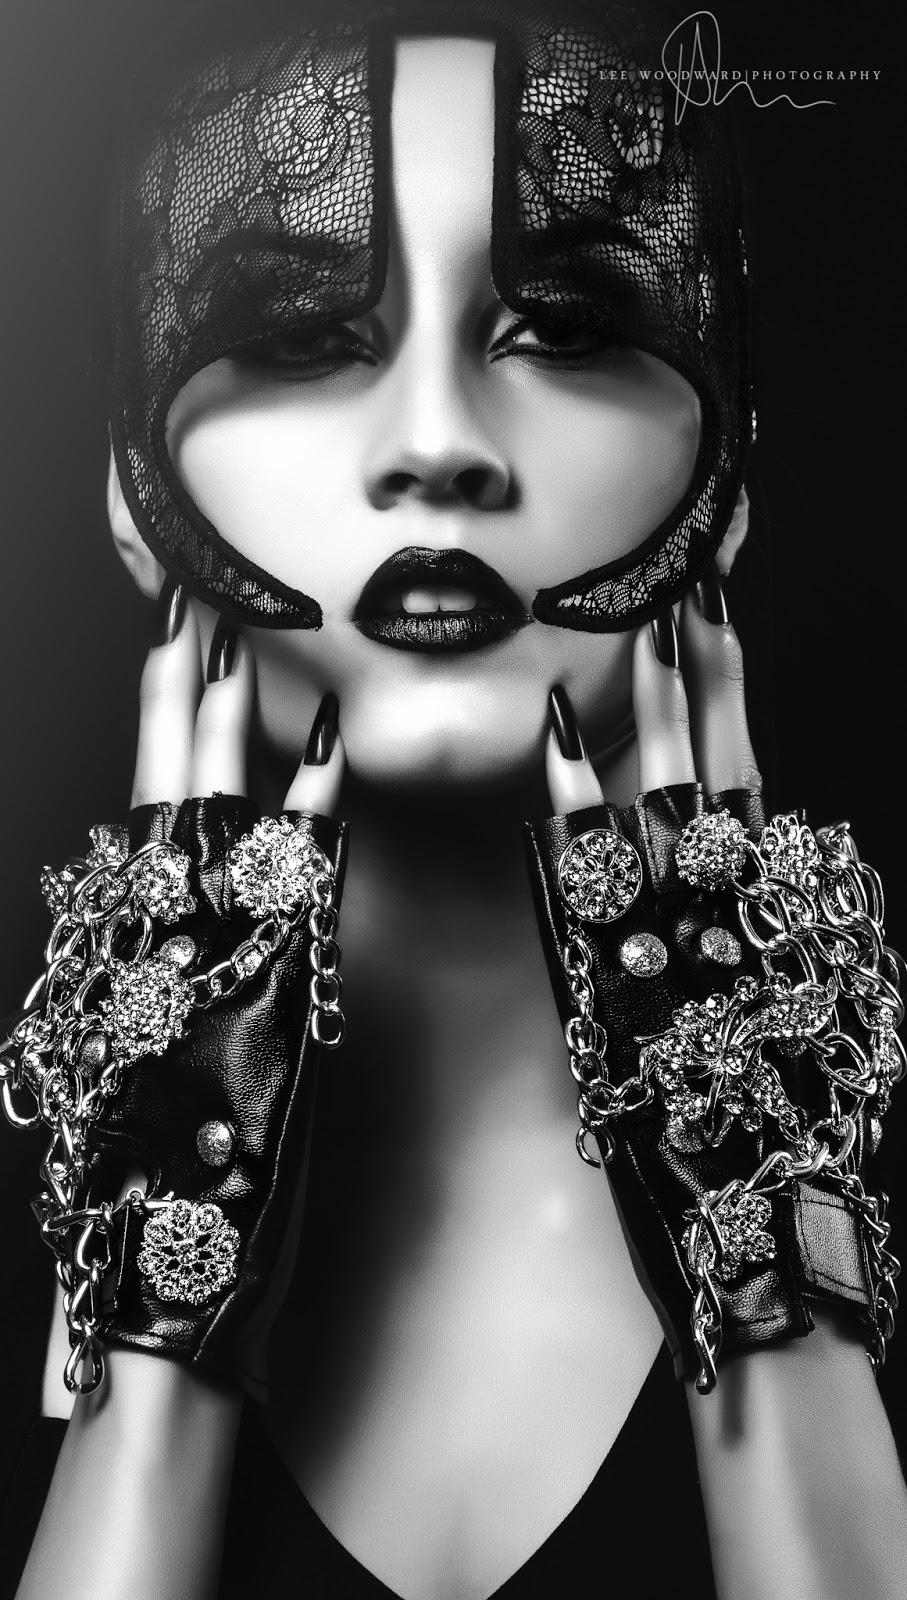 Mystic Magic, Shades Of Grey, fifty shades, fifty shades of grey, Lee Woodward Photography, photo, photography, fashion, high fashion photography, fetish, high fashion, fashion photo, dark beauty, photo shoot, masks, masquerade, mask photography, lace, lace mask, black and white photo, style, vogue